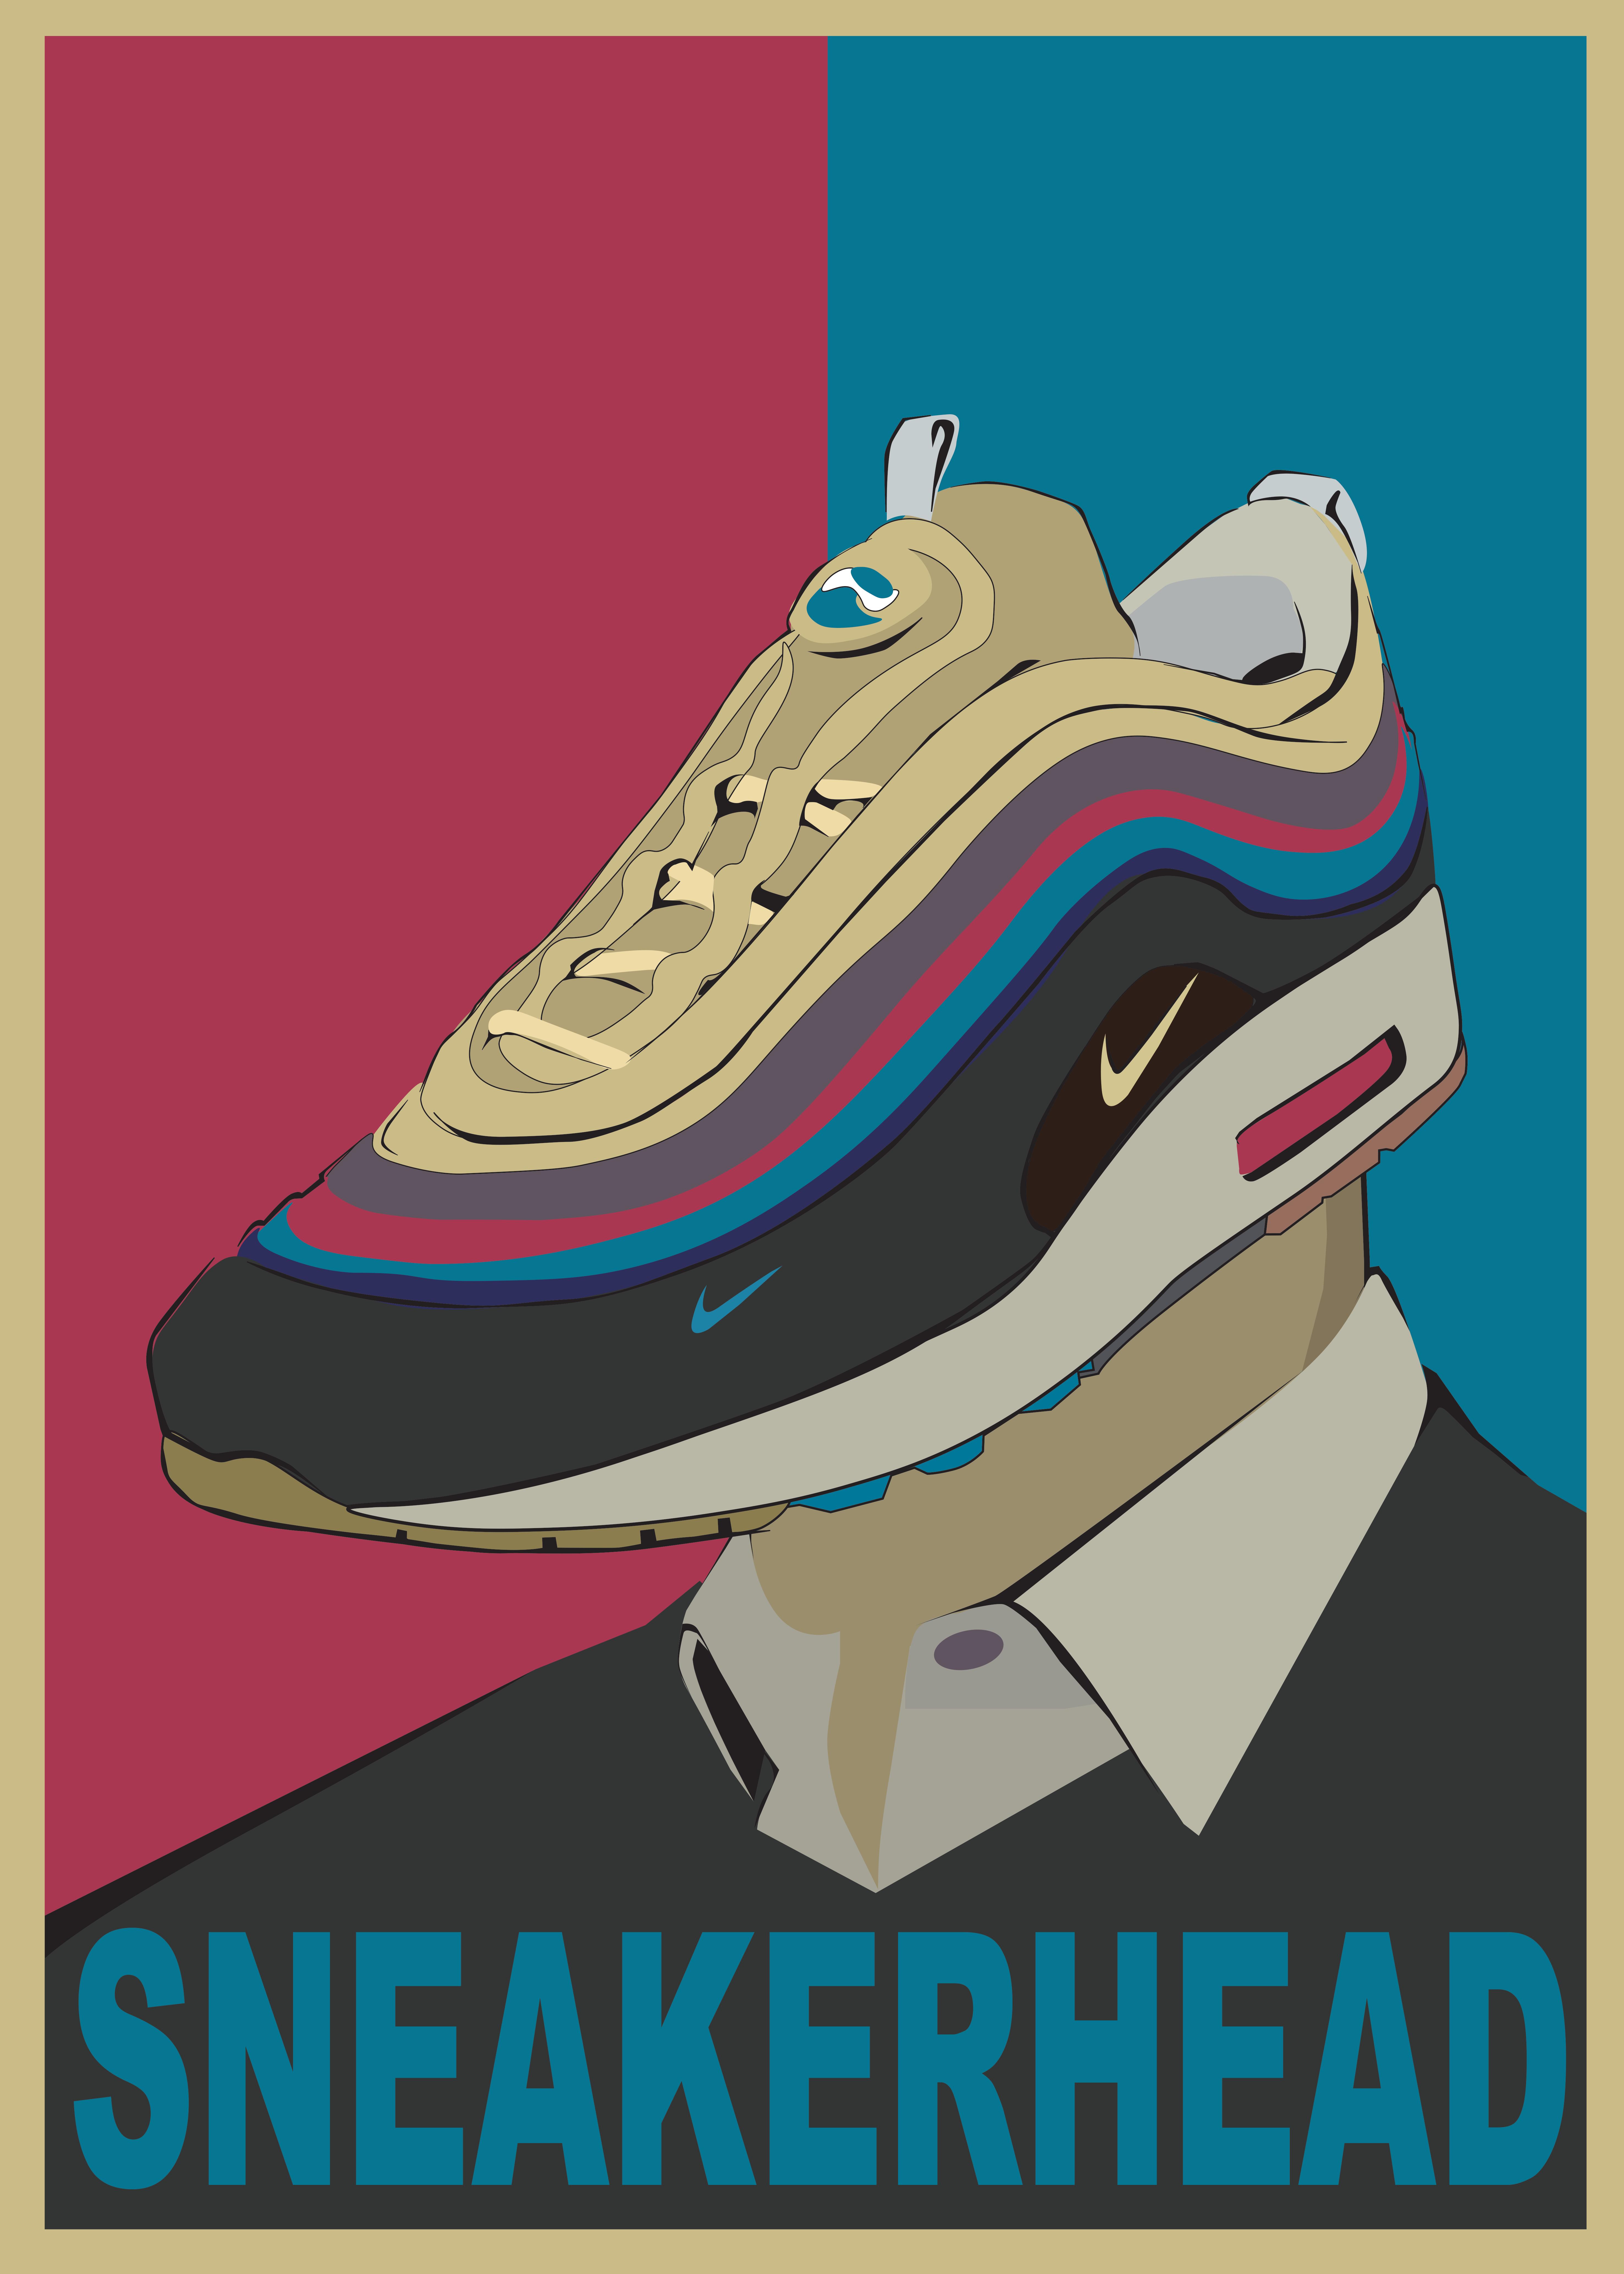 Sneakerhead Poster Airmax 1 97 Sean Wotherspoon Hypebeast Poster Streetwear Poster Wall Art Sneaker Art Sneaker Head Sneakers Wallpaper